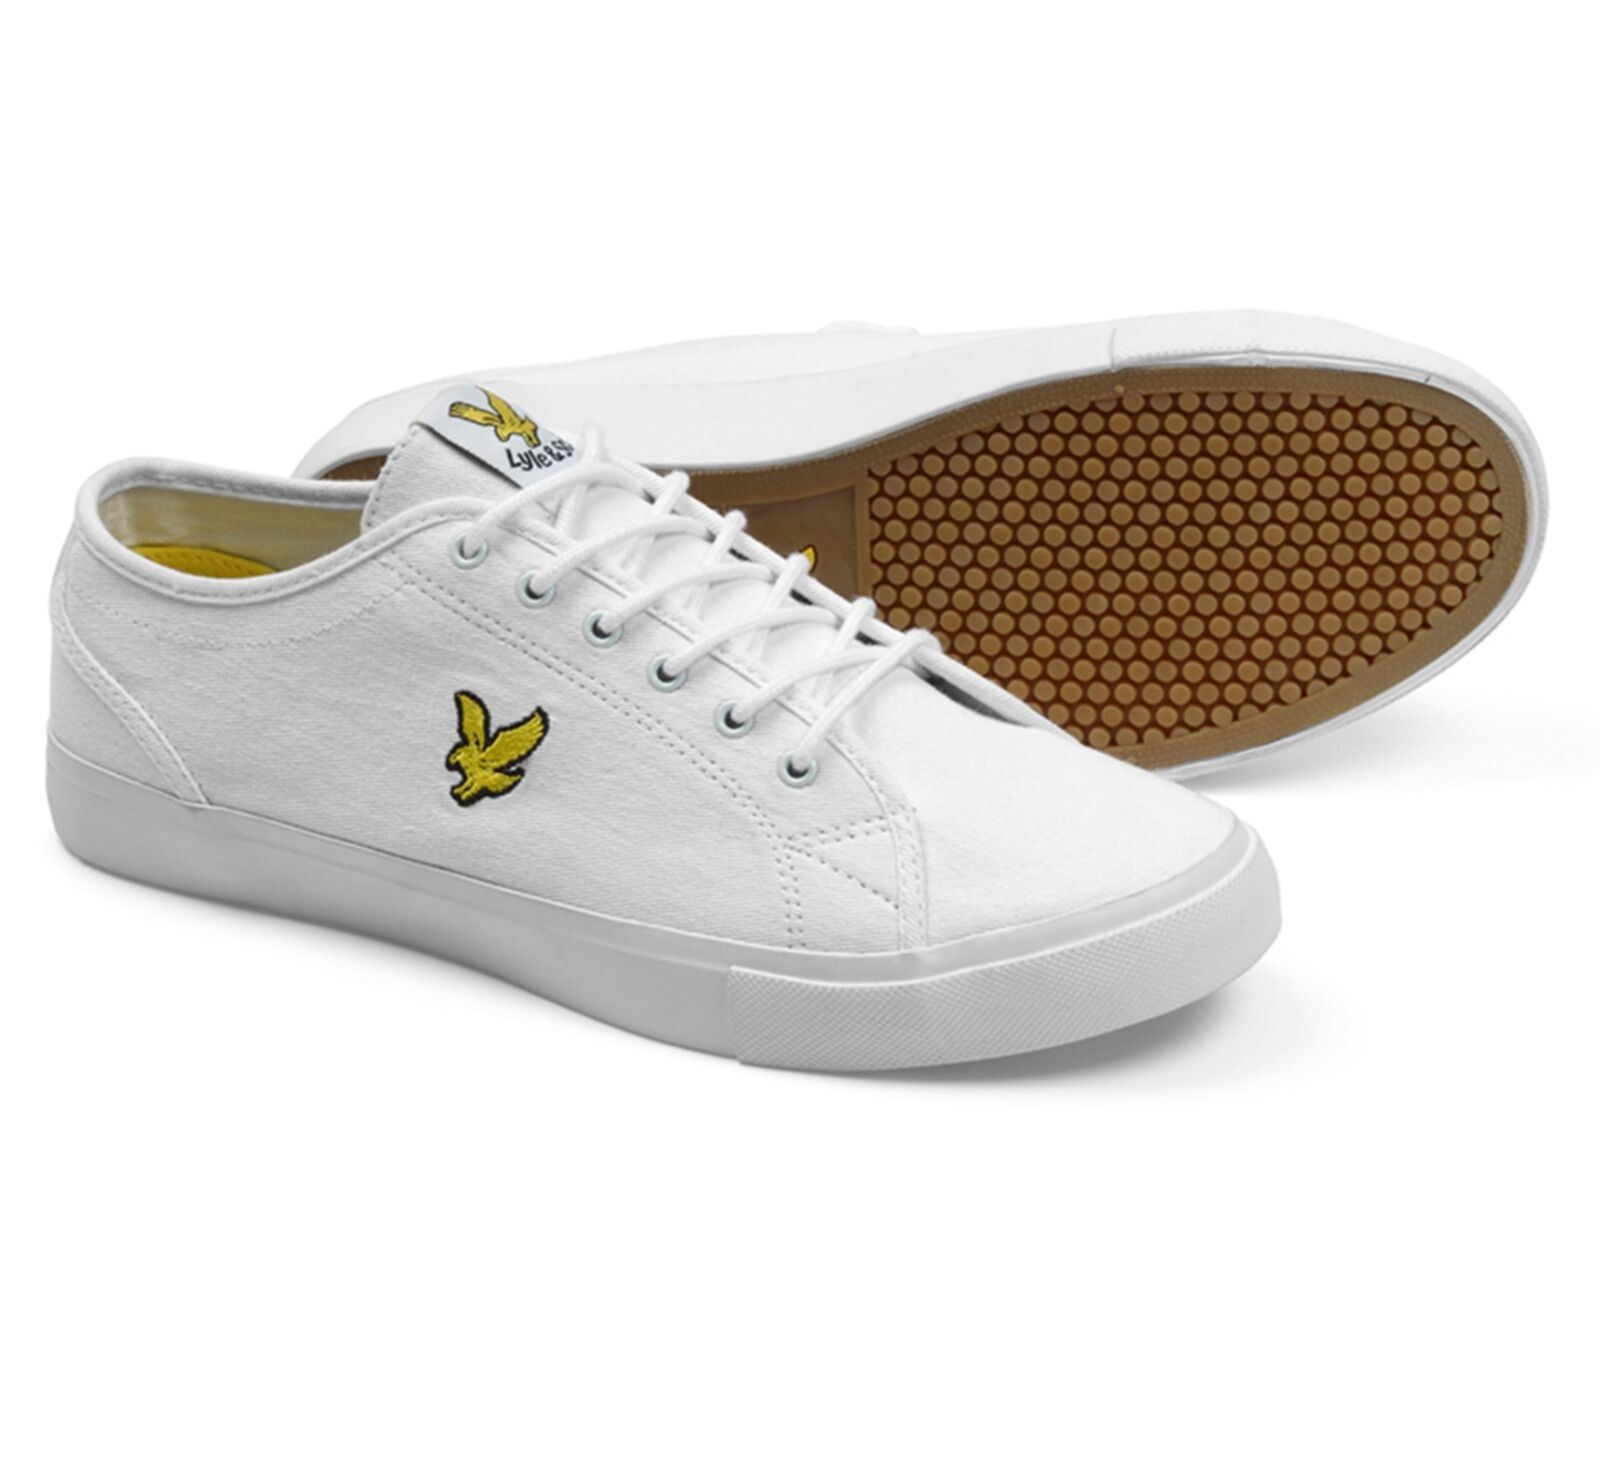 Lyle & Scott Eagle Canvas Teviot Twill Fashion Plimsolls Shoes Trainers White